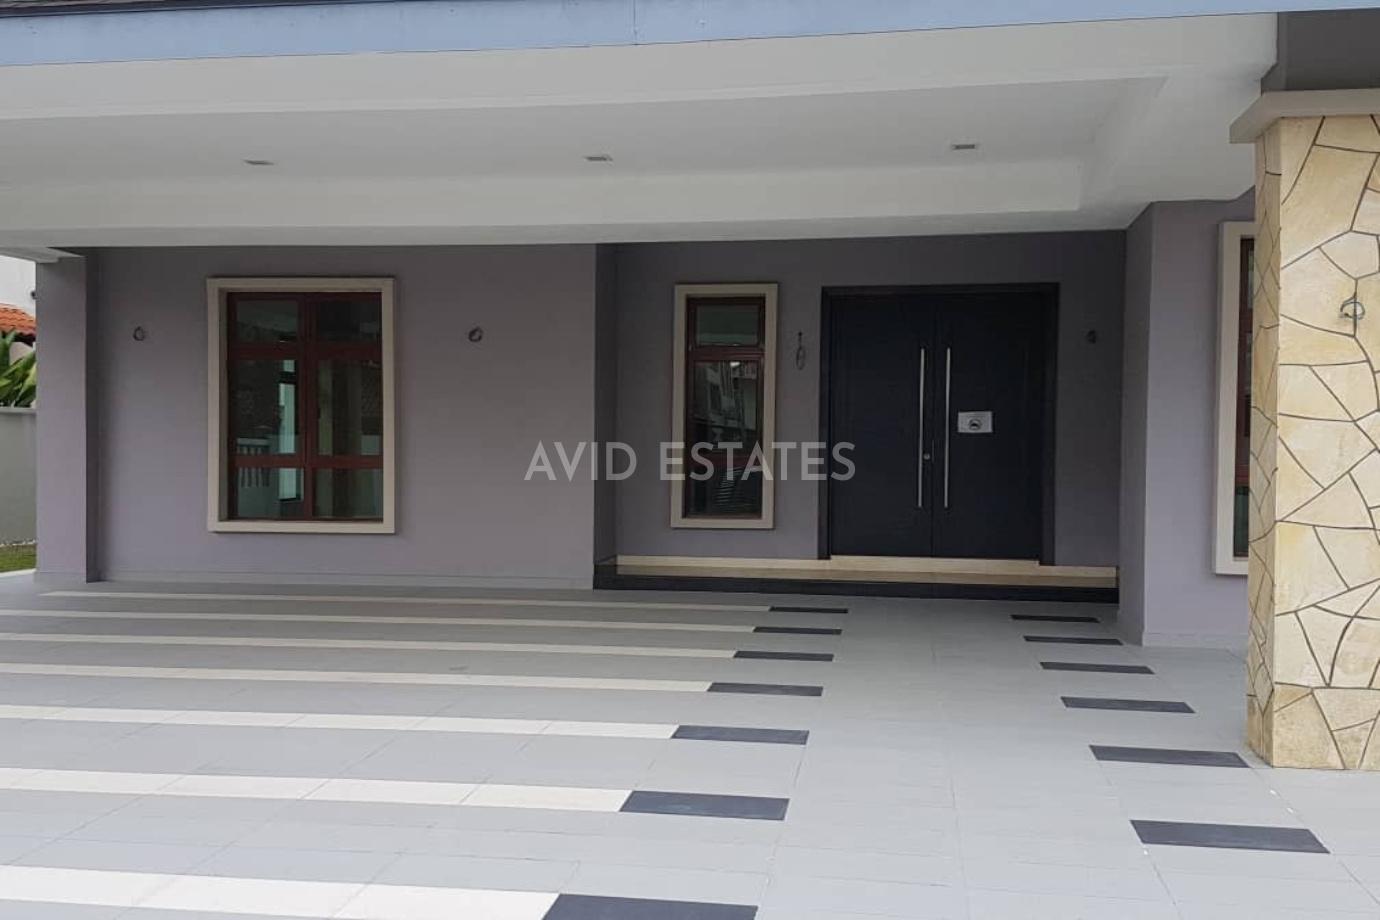 Selangor Polo Country Club, Kota Damansara, 5 Bedrooms Bedrooms, ,5 BathroomsBathrooms,Bungalow / Detached,For Sale,Kota Damansara,Selangor Polo Country Club,2031